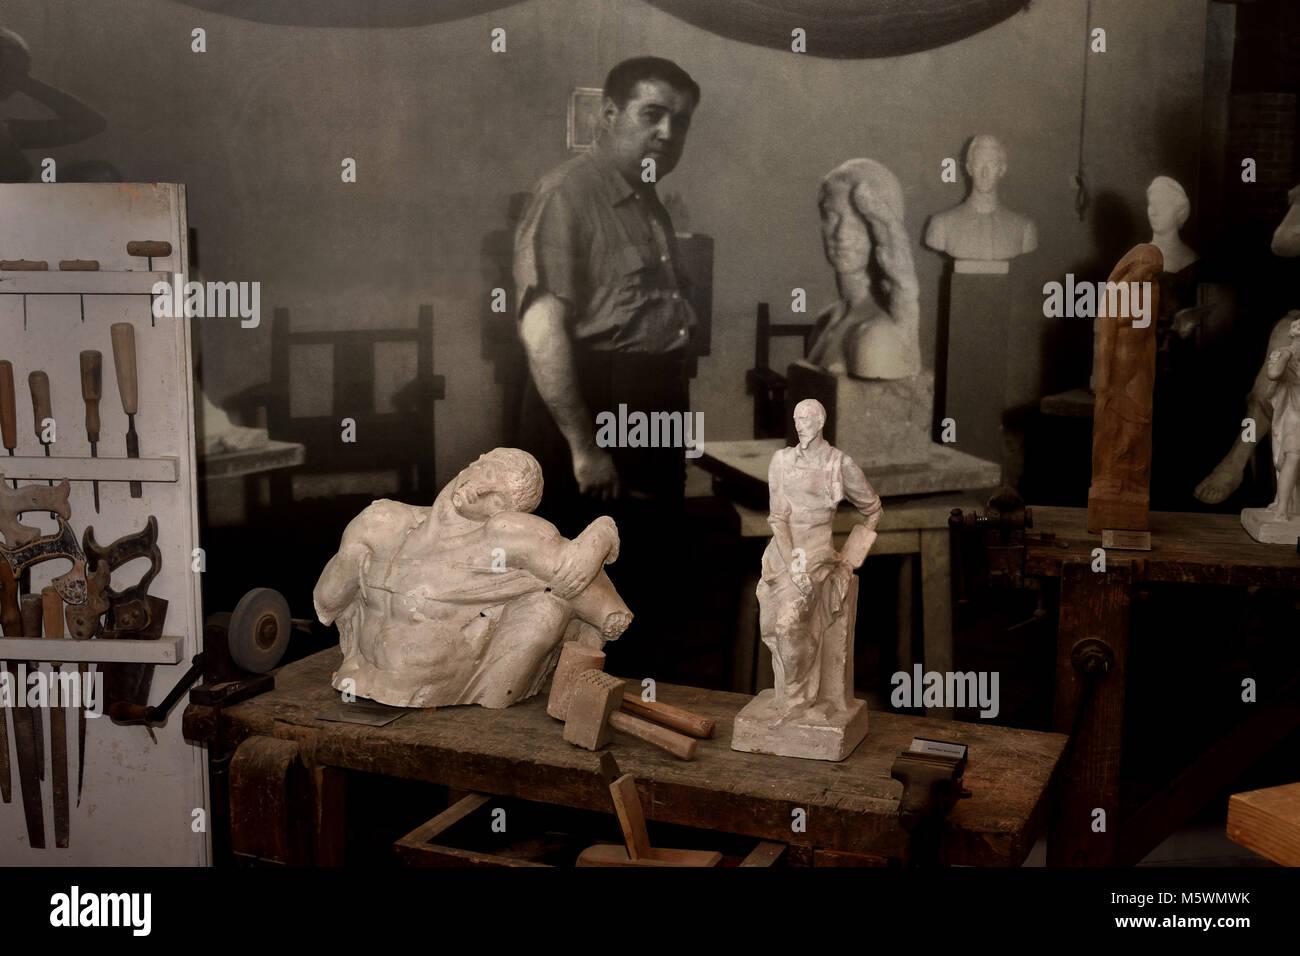 Workshop of Juan Luis Vassallo, Parodi, (Cádiz 1908 - Madrid 1986), sculptor and carver, Spanish,Spain, 20th,century, - Stock Image